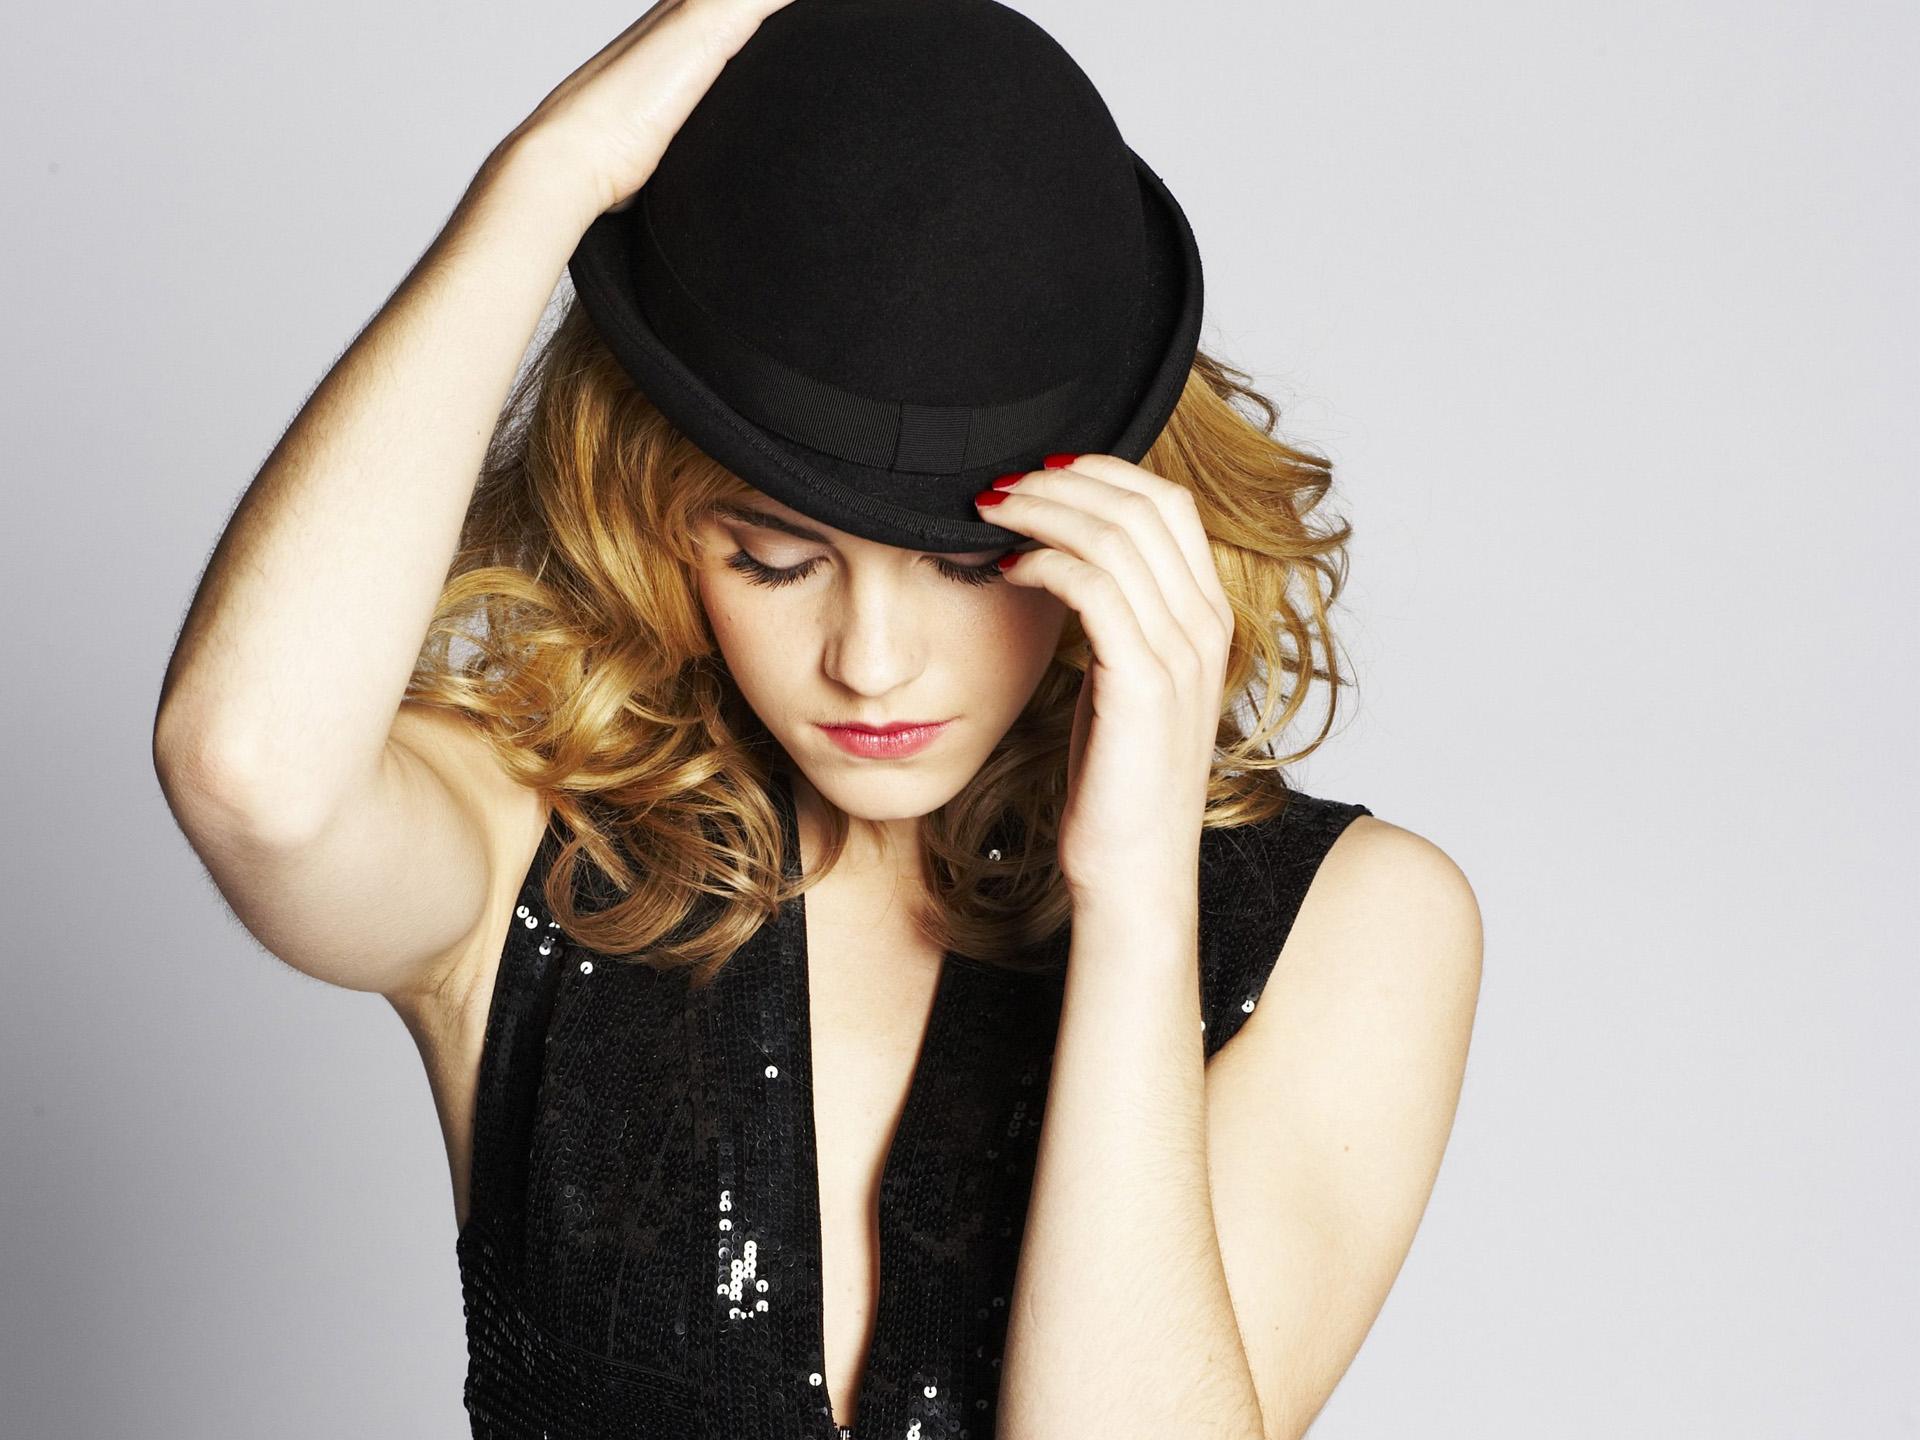 emma watson hat wallpaper 50396 1920x1440px